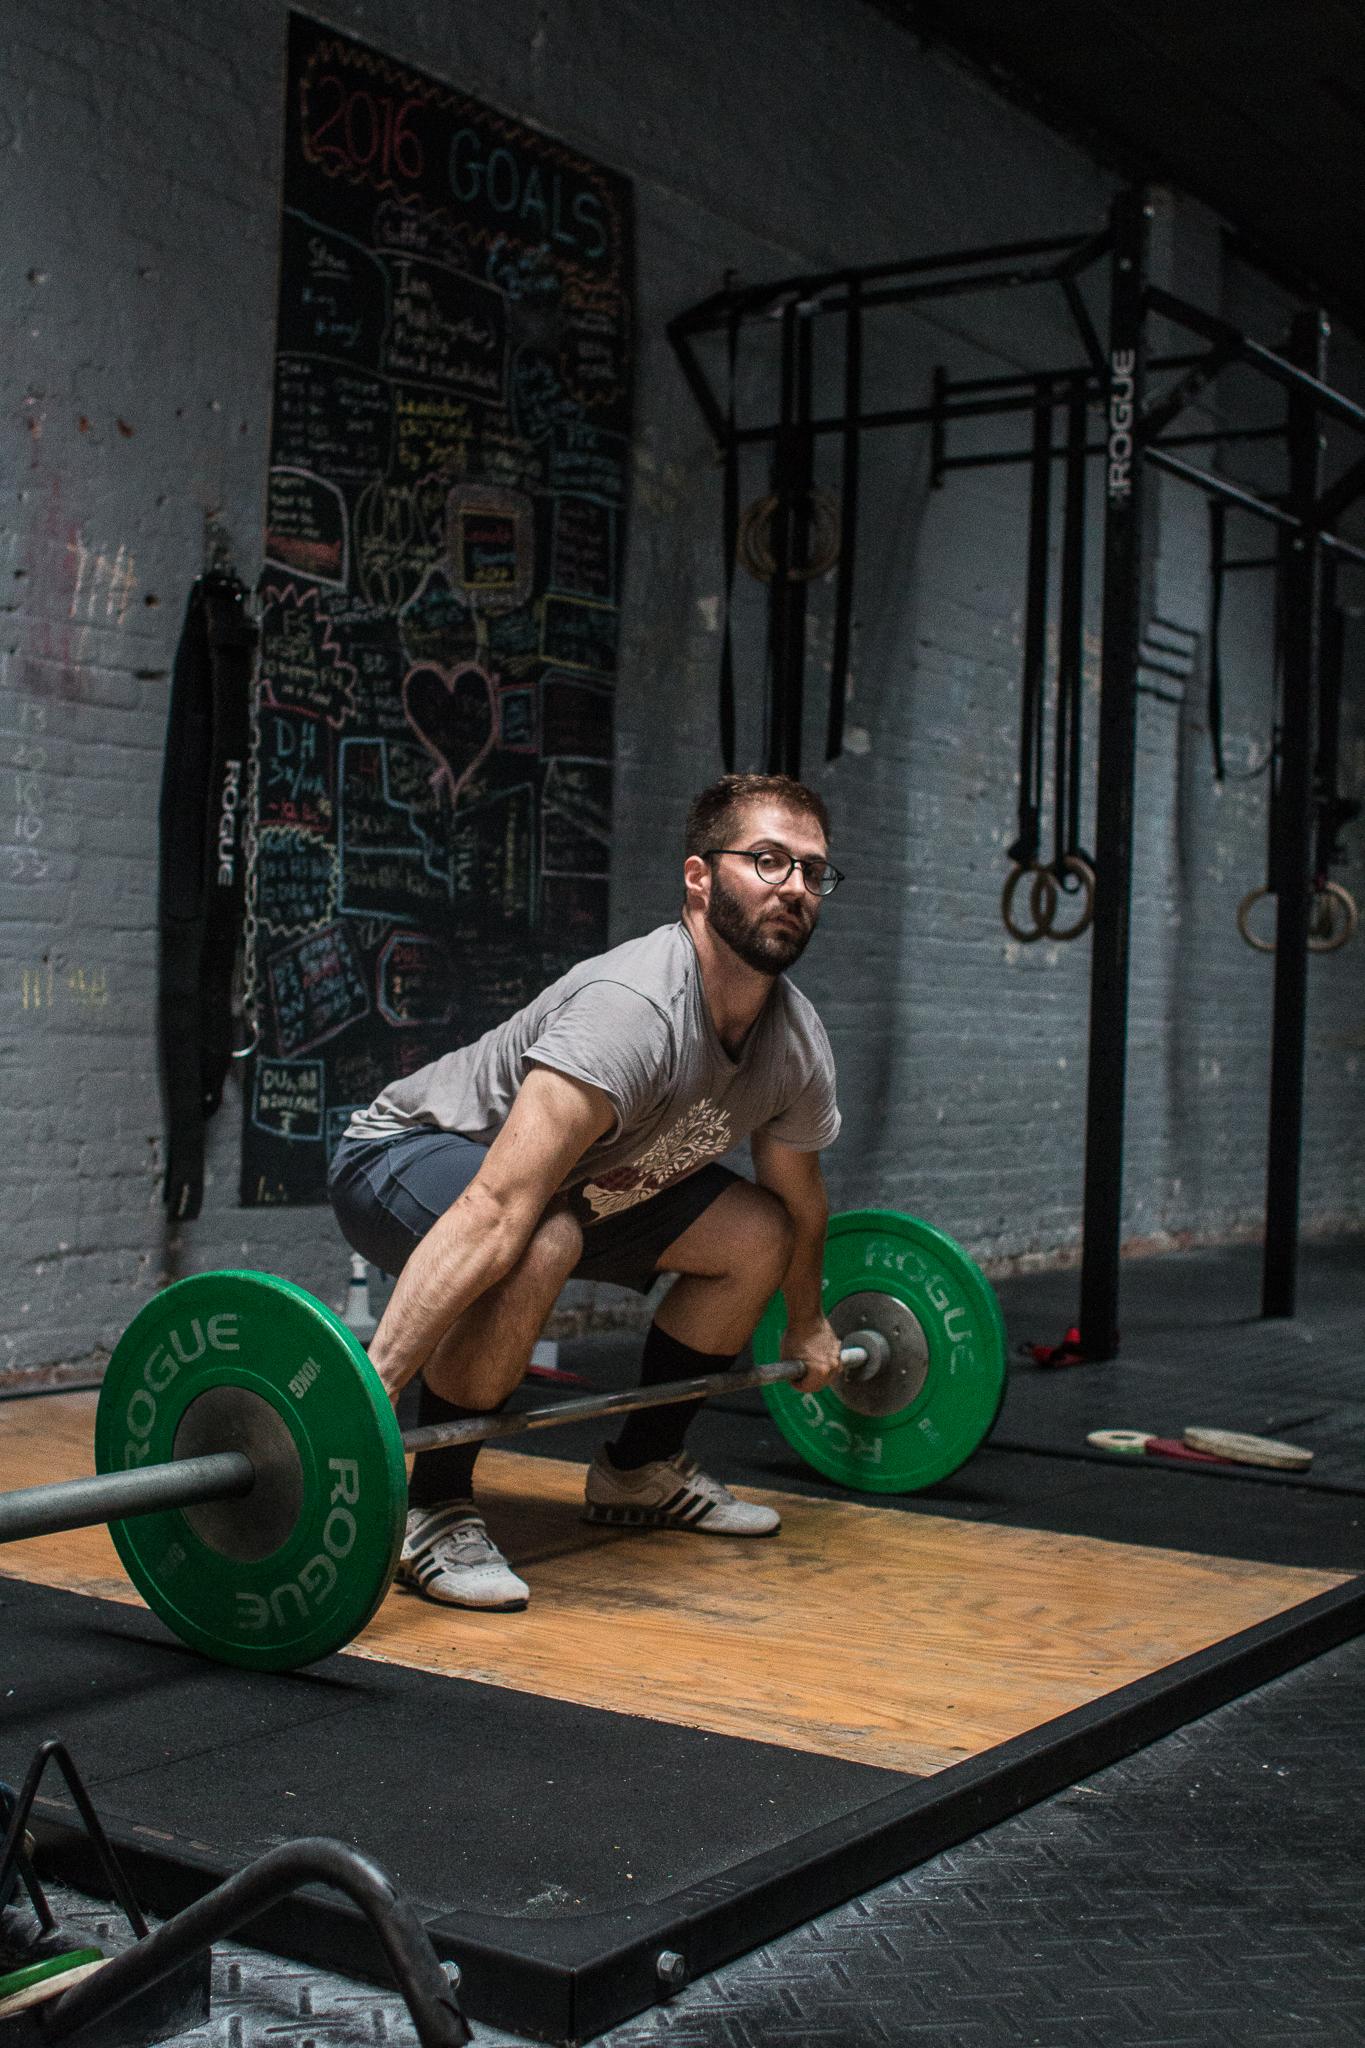 james-wright-visit-brooklyn-new-york-weightlifting-coach-teammates-october-2016 (42 of 92).jpg